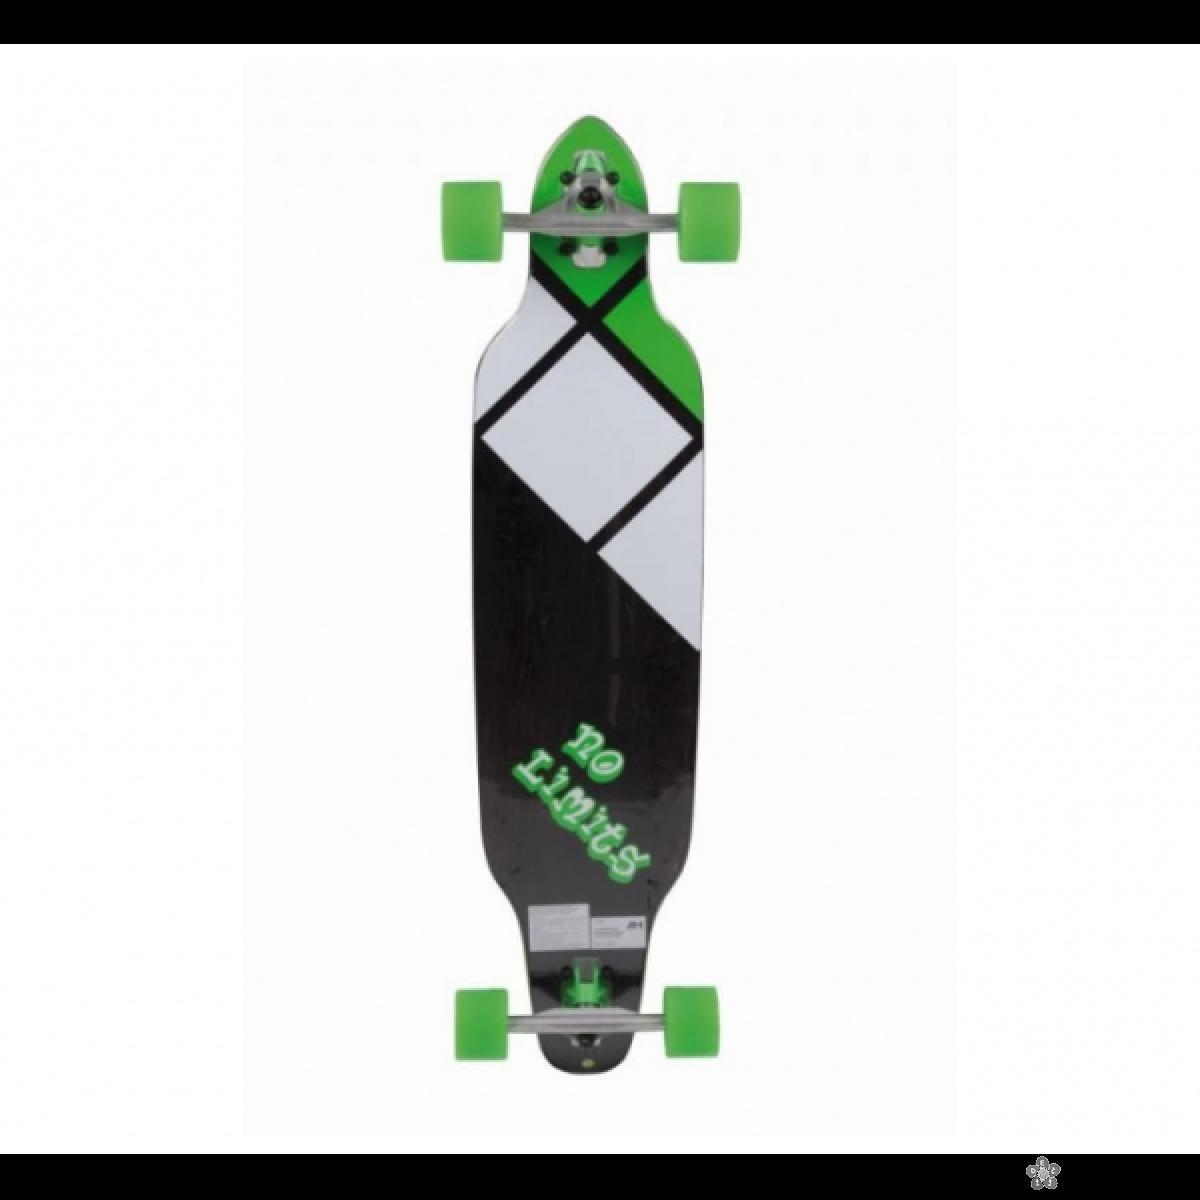 Skate drveni No Limits 96cm 44048